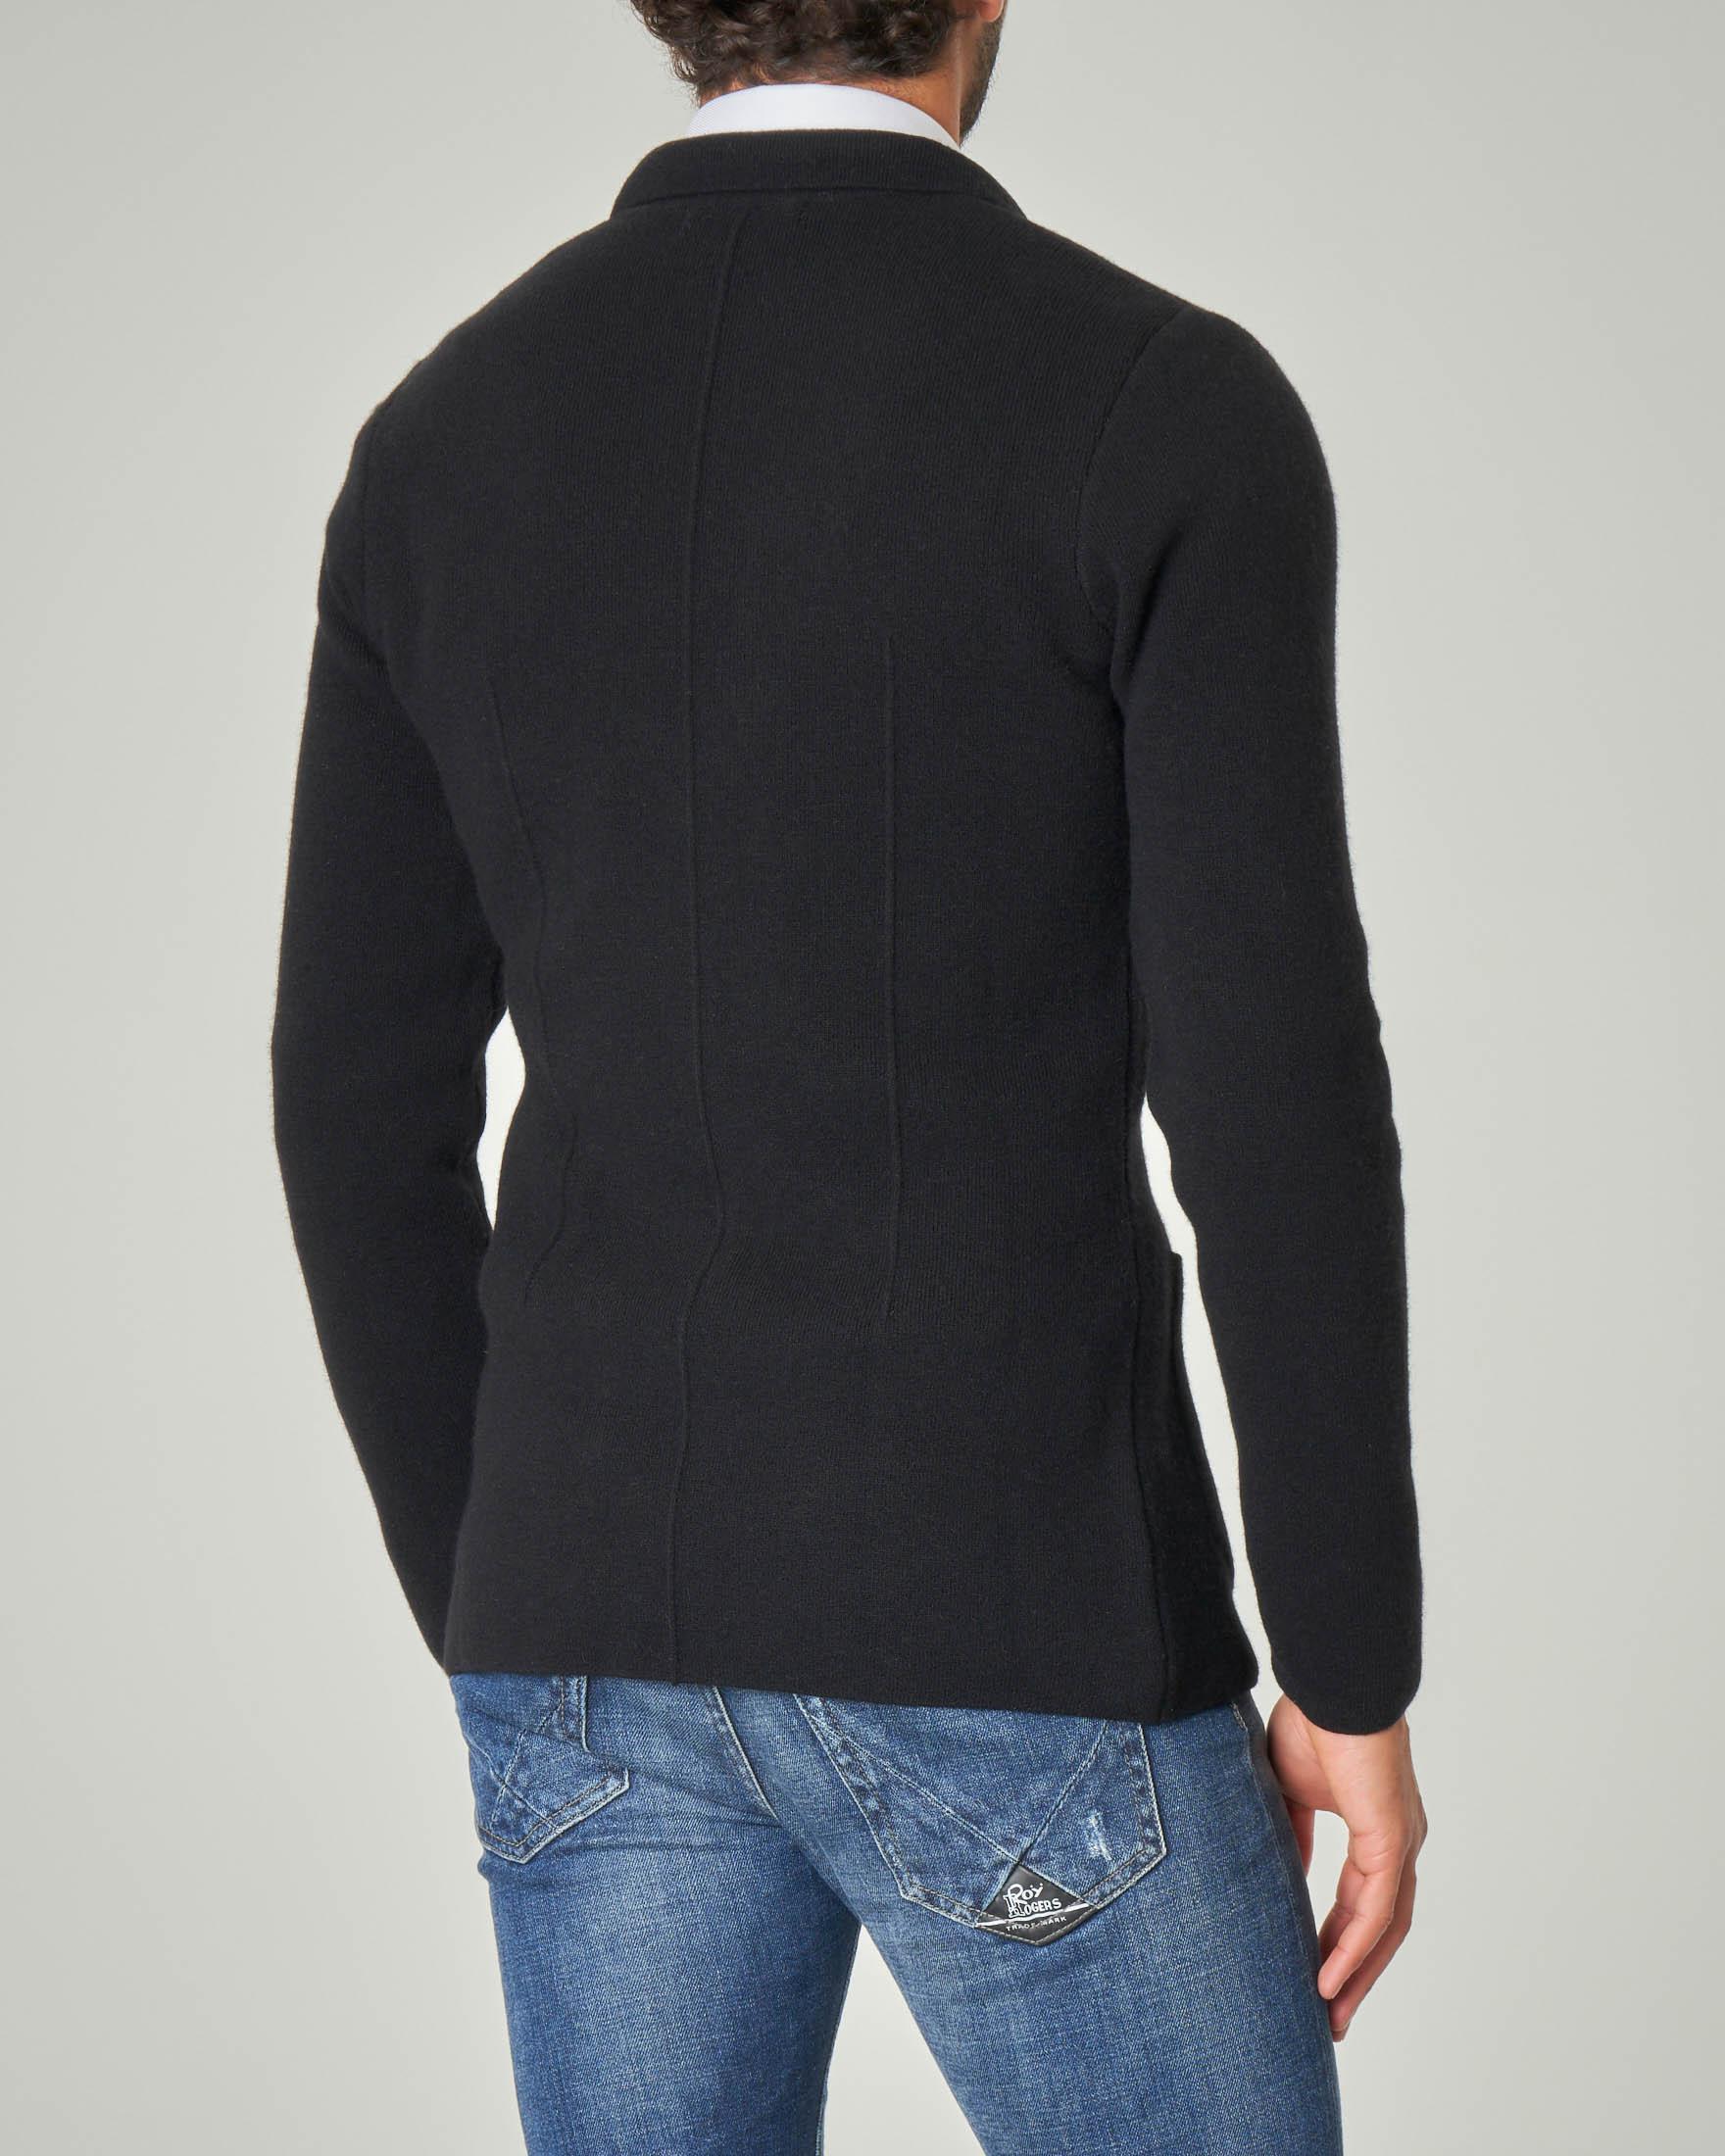 Giacca maglia nera tinta unita